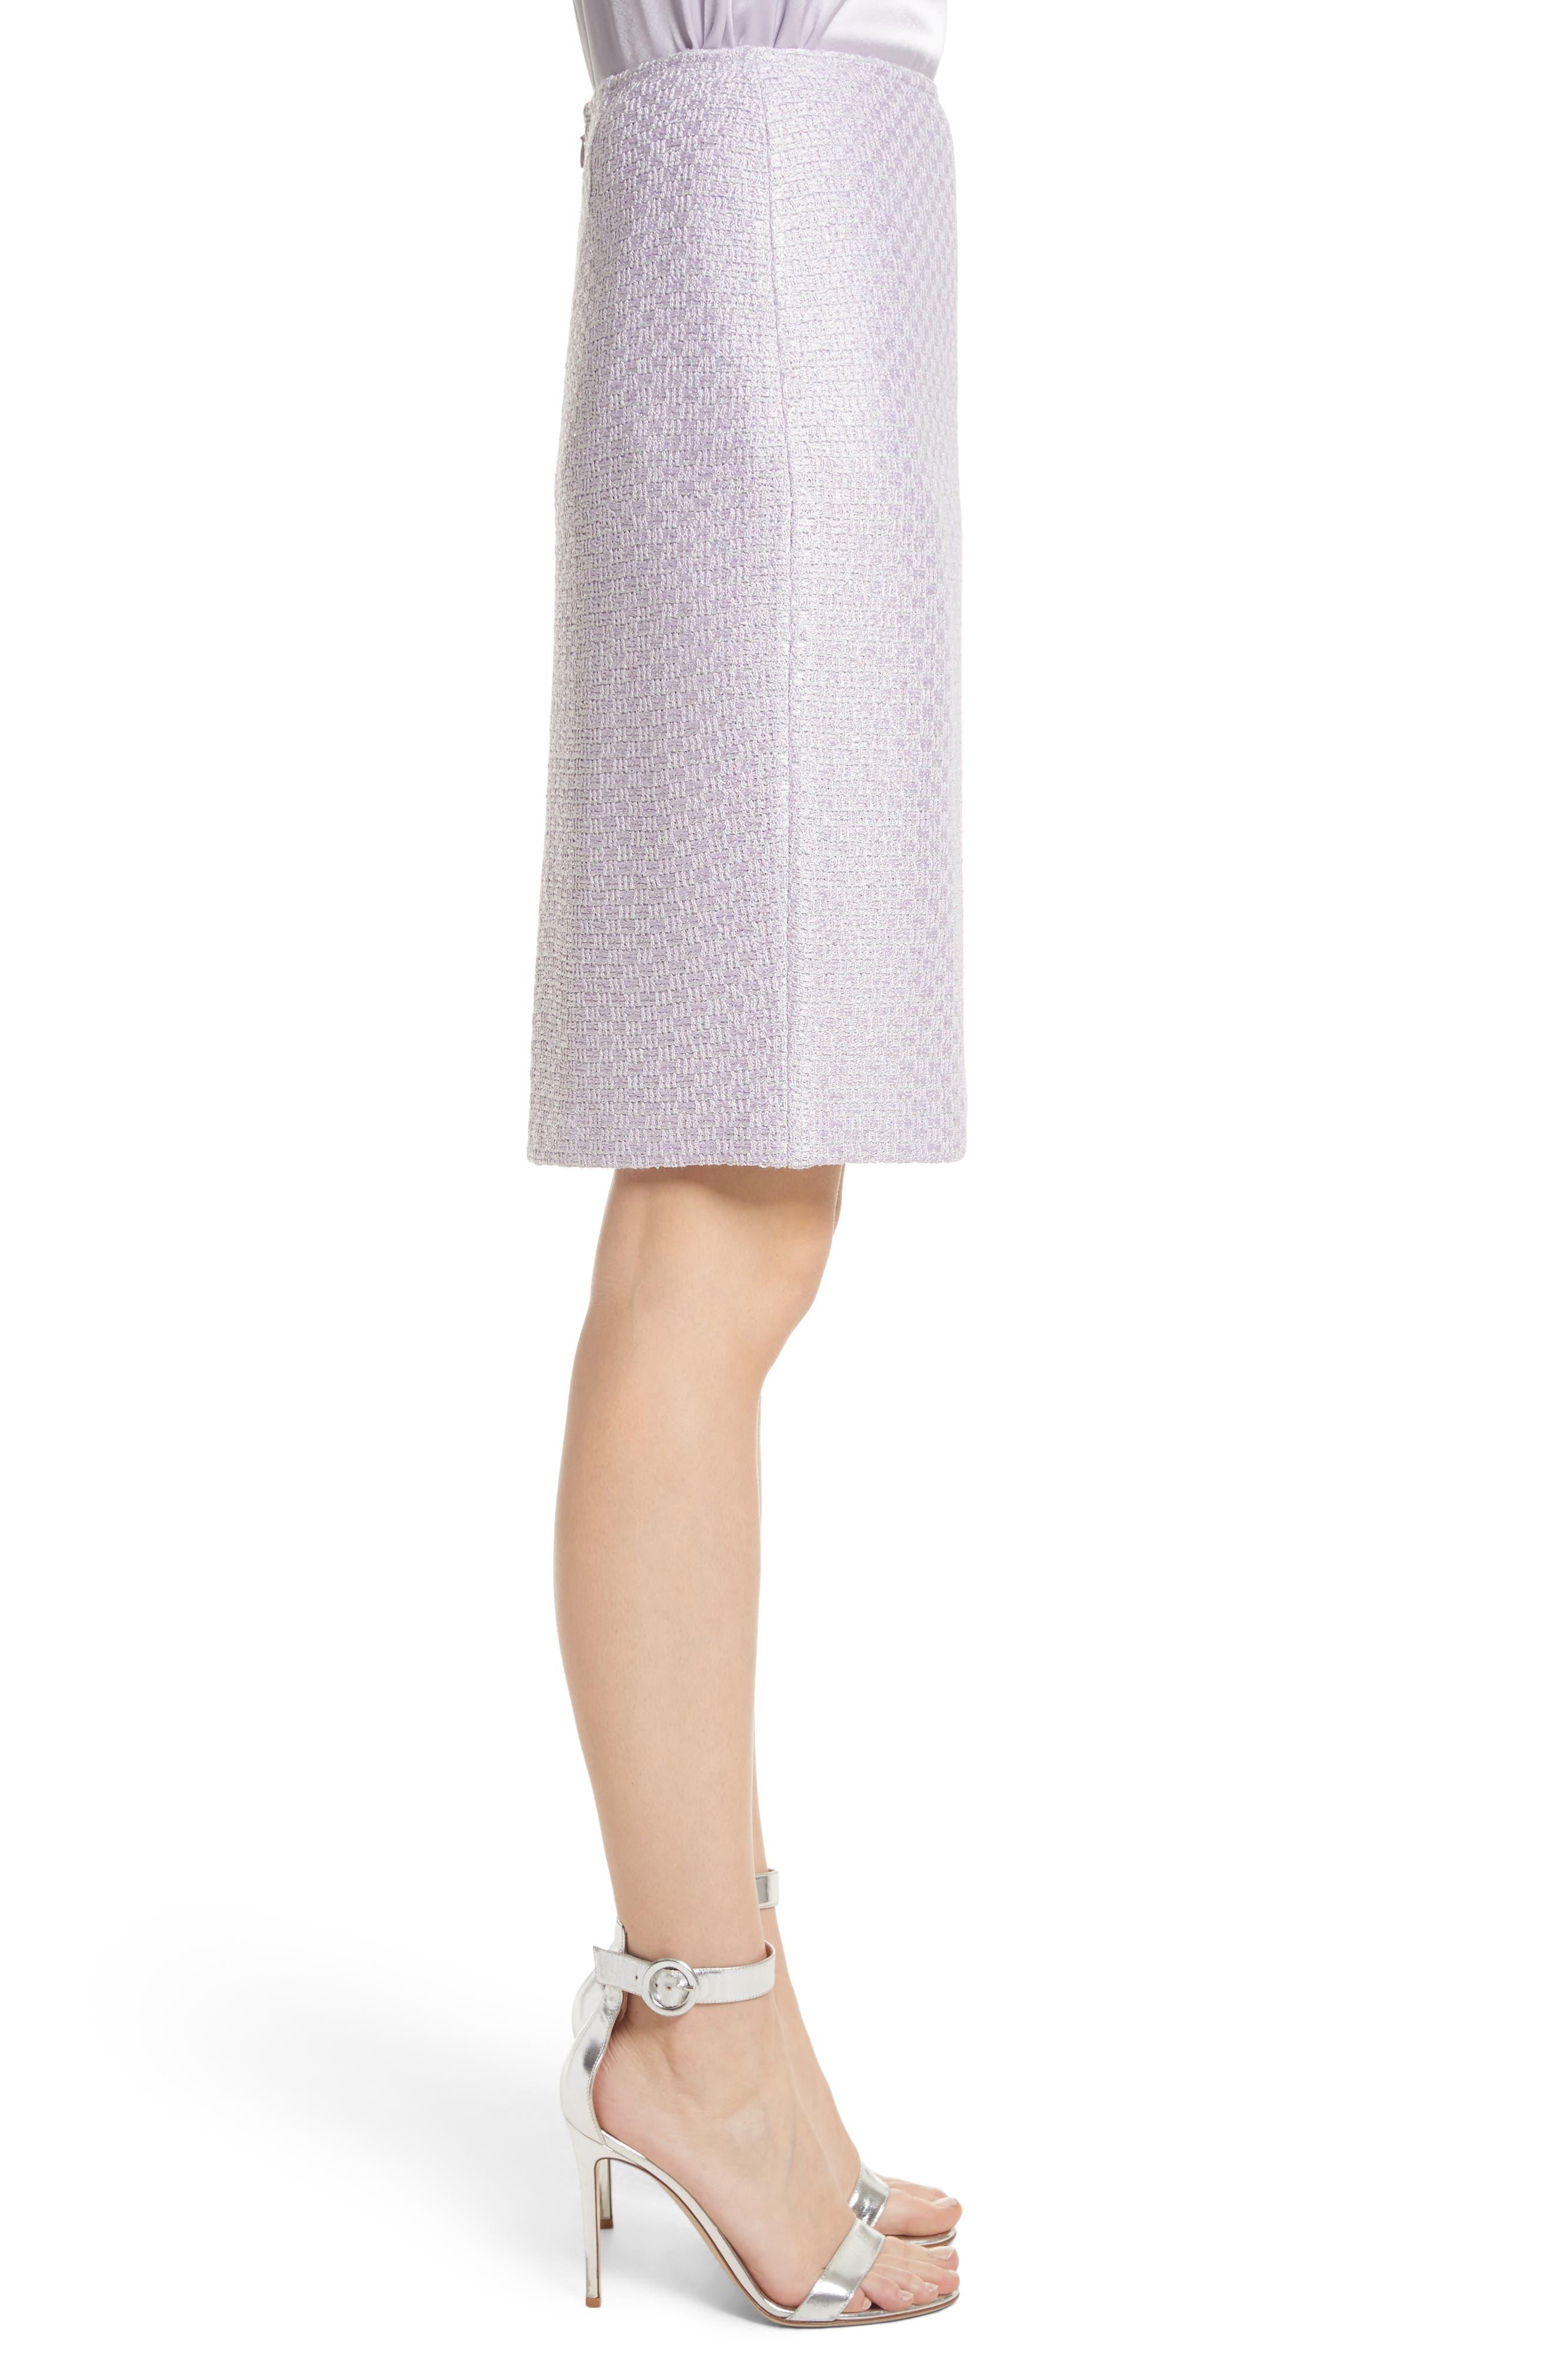 Hansh Sequin Knit Pencil Skirt,                             Alternate thumbnail 3, color,                             Lilac Multi